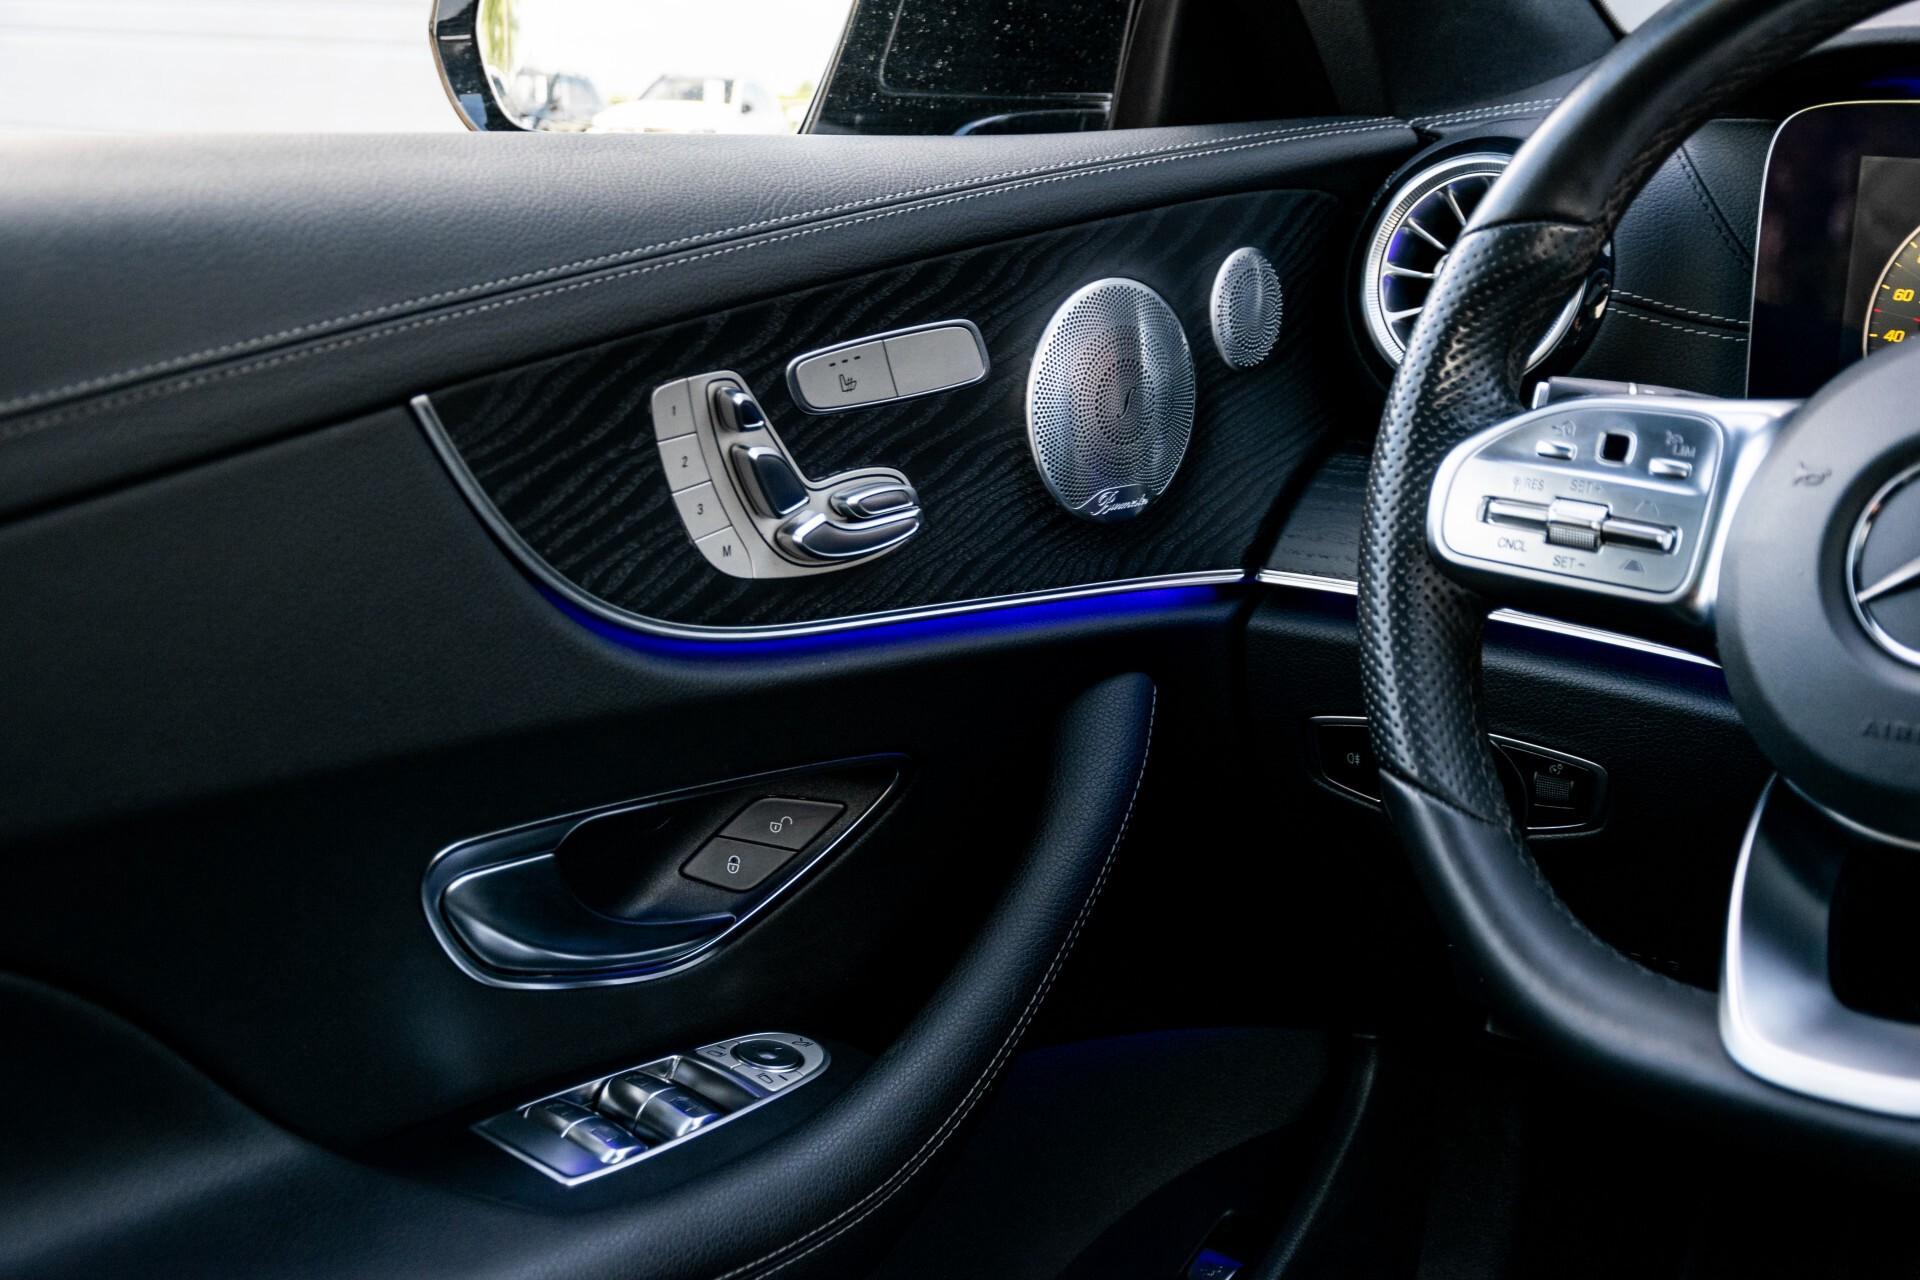 Mercedes-Benz E-Klasse Coupé 300 AMG Panorama/Rij-assist/Keyless/Massage/Memory/HUD/Standkachel/Night Aut9 Foto 46